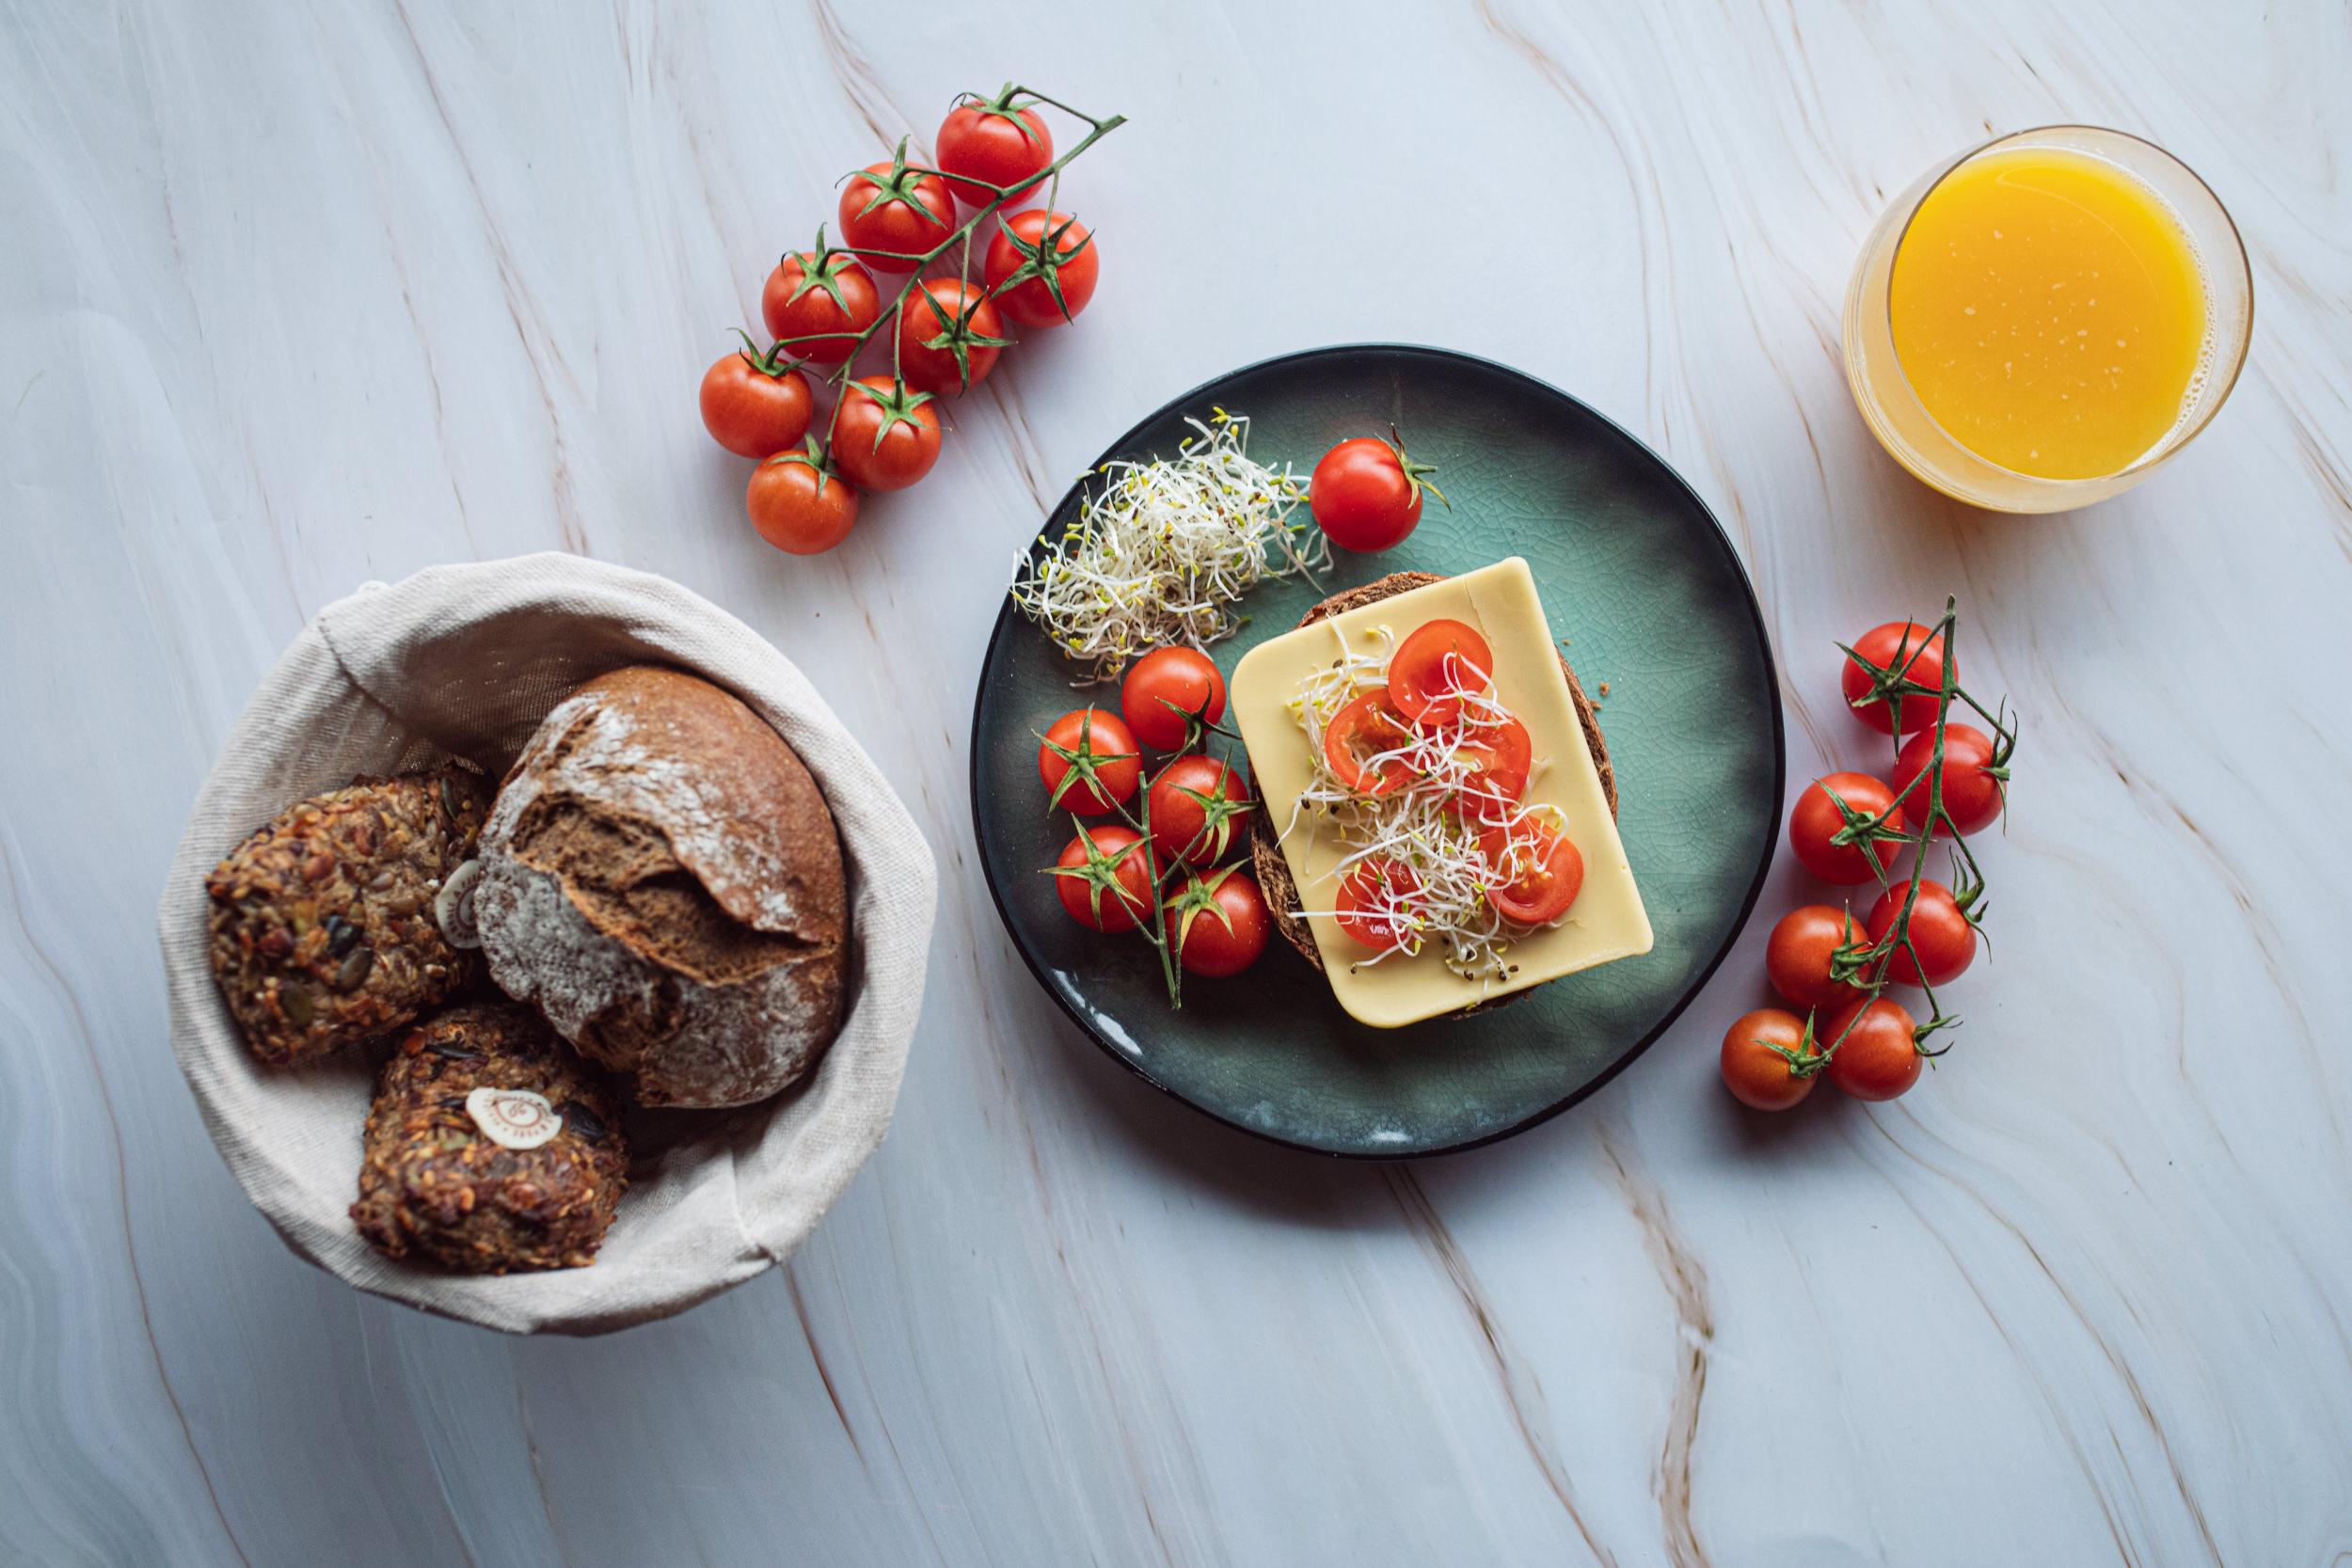 FOOD STUDIO PATRICKSCHMETZER IMG 12 Food